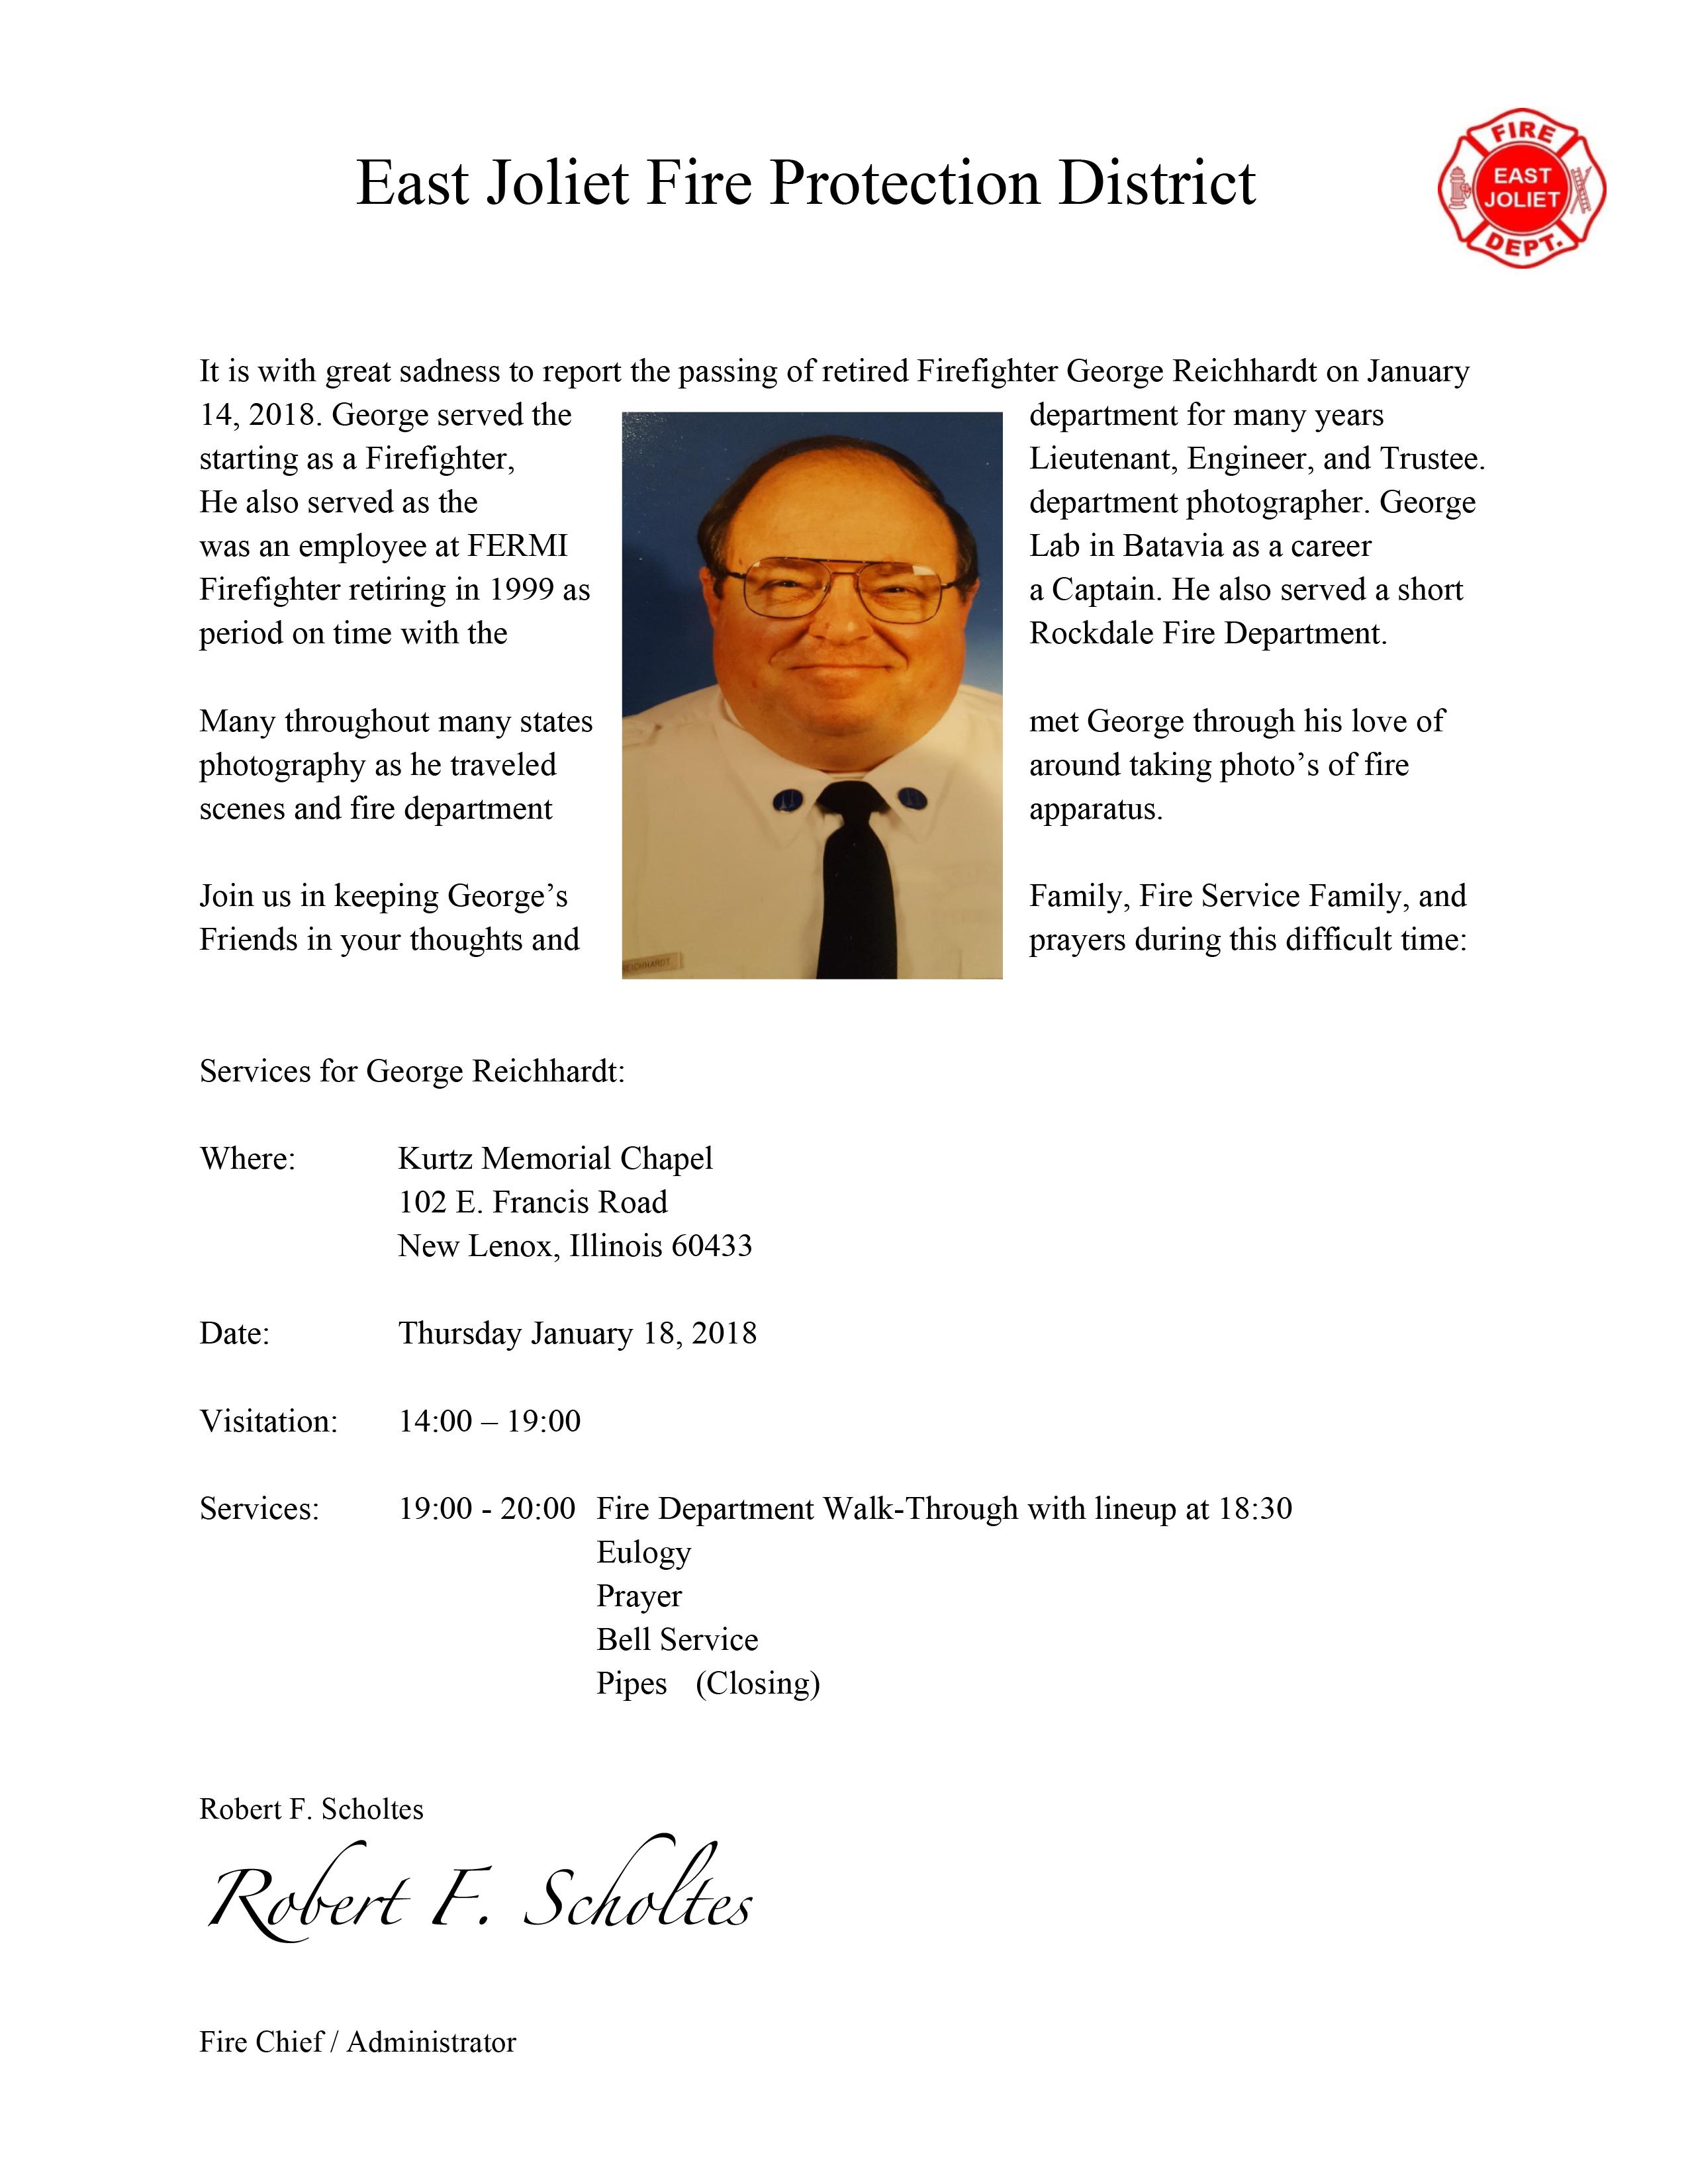 Funeral arrangements for George Reichhardt